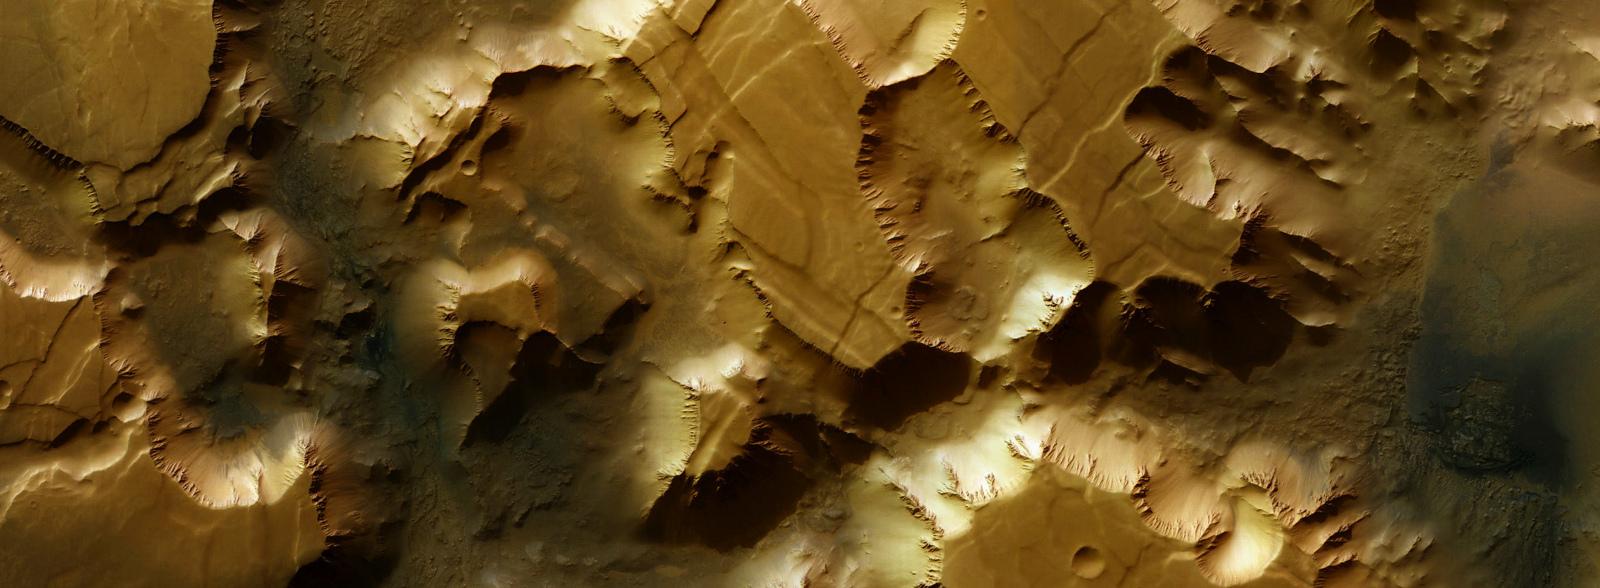 Мозаичное изображени Лабиринта ночи (Noctis Labyrinthus), снимок Mars Express